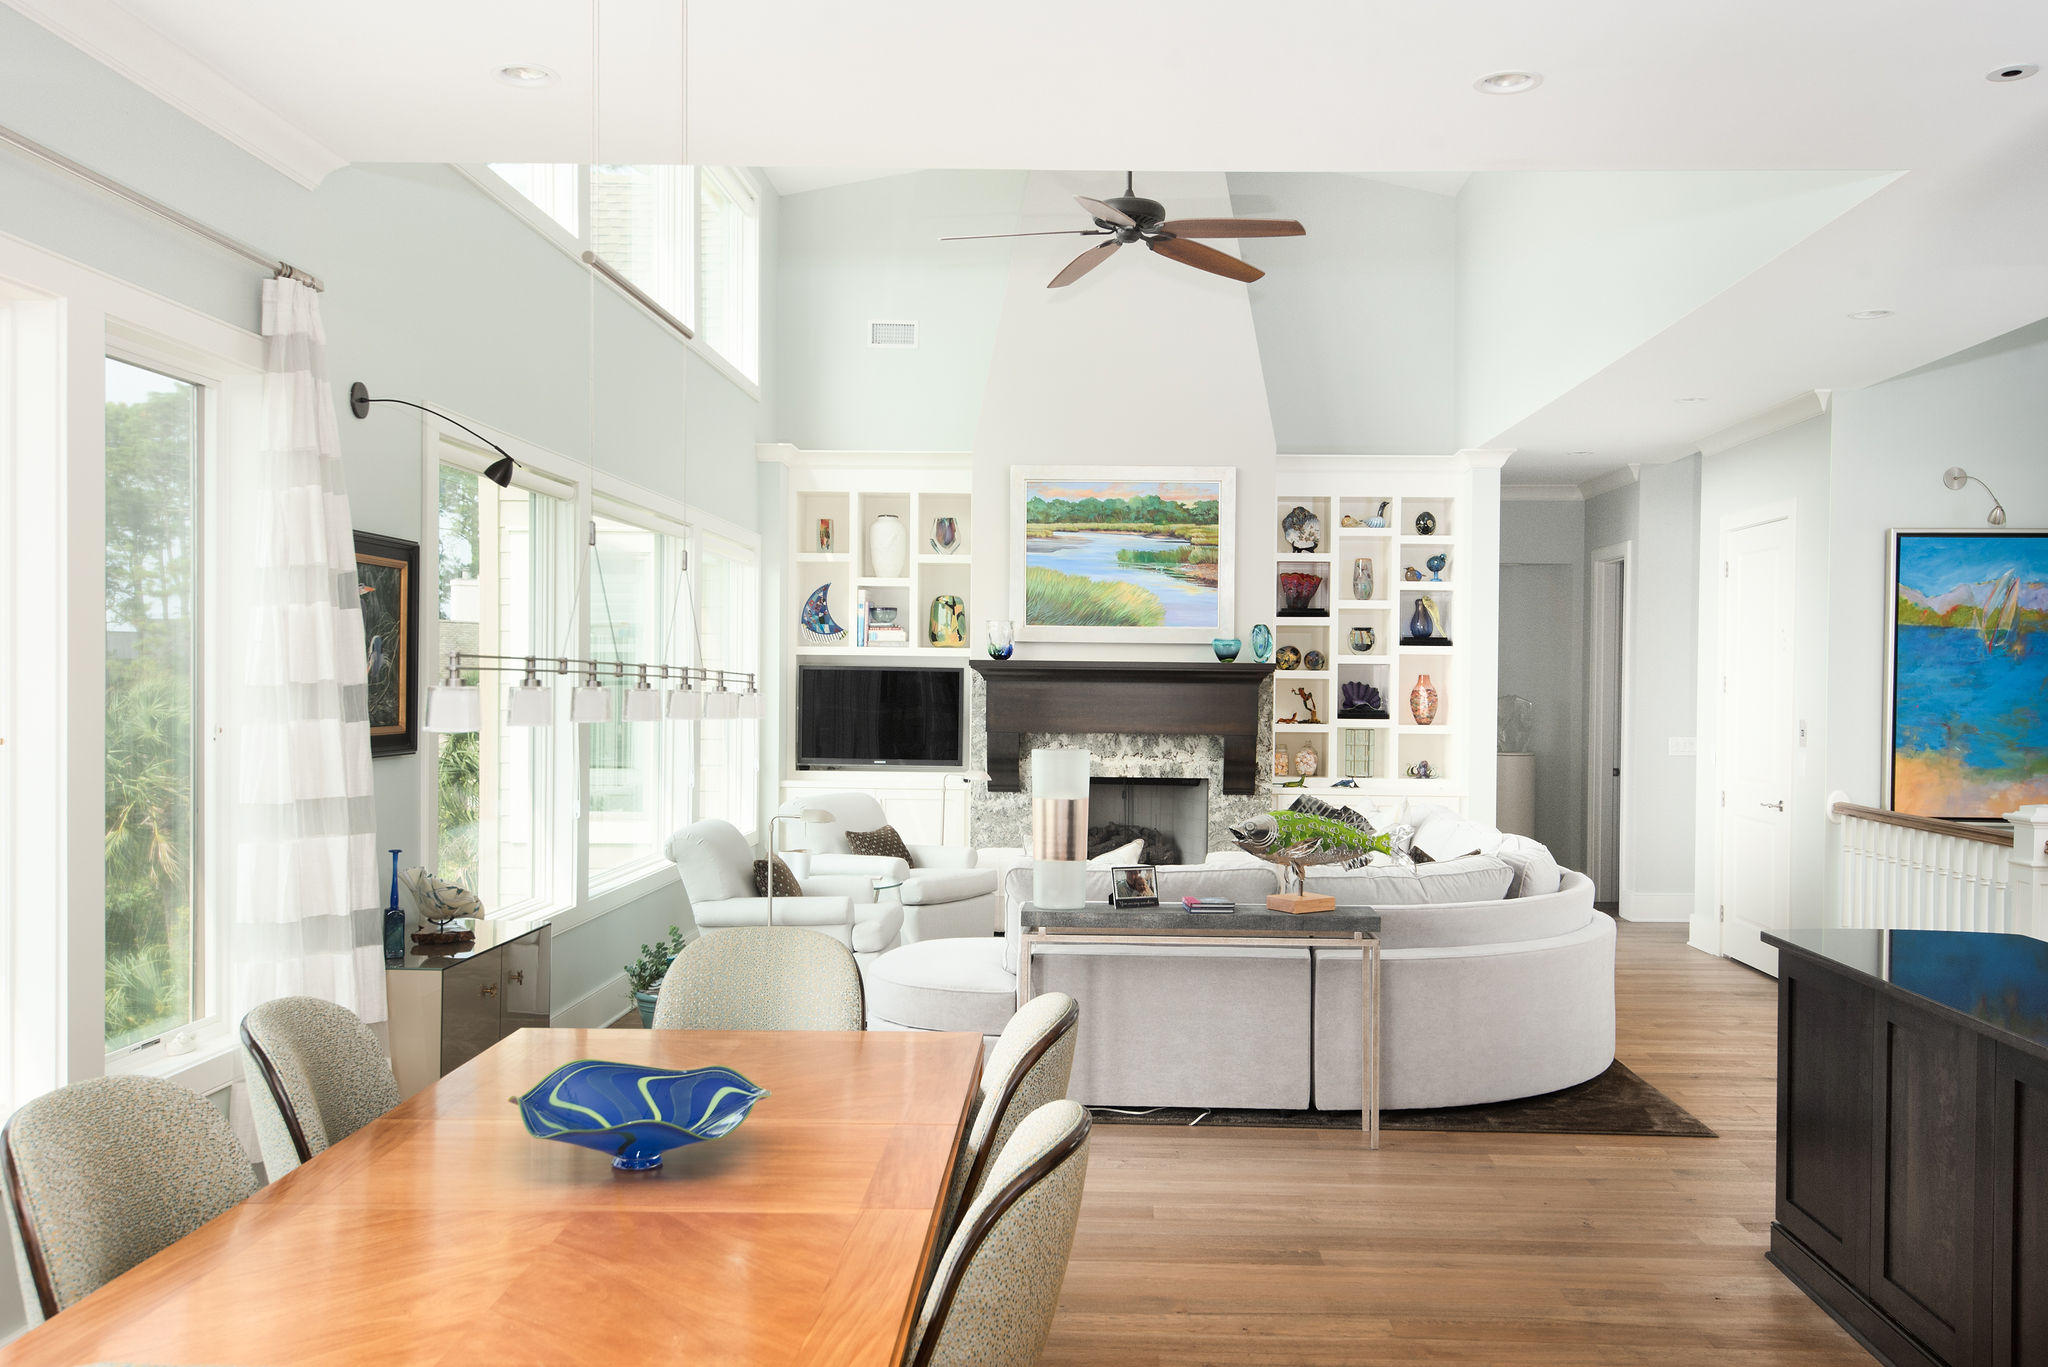 Seabrook Island Homes For Sale - 3135 Marshgate, Seabrook Island, SC - 55